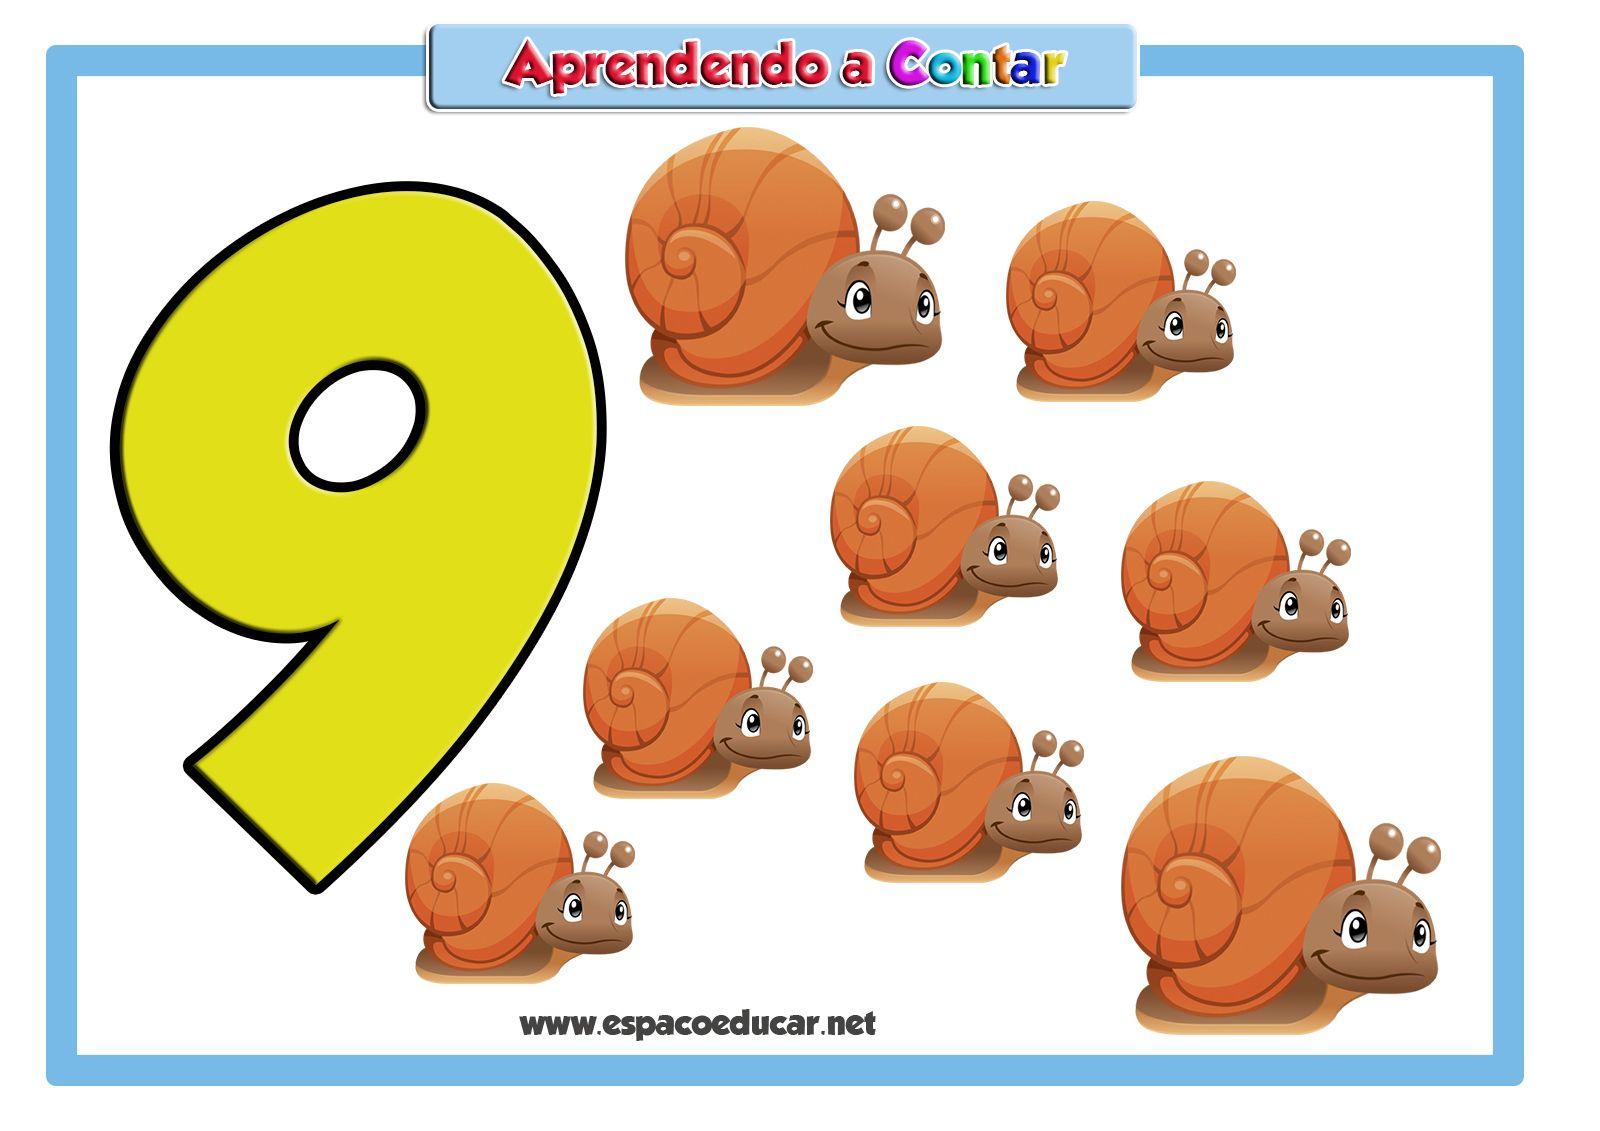 cartazes numerais coloridos gr c3 a1tis para voc c3 aa imprimir